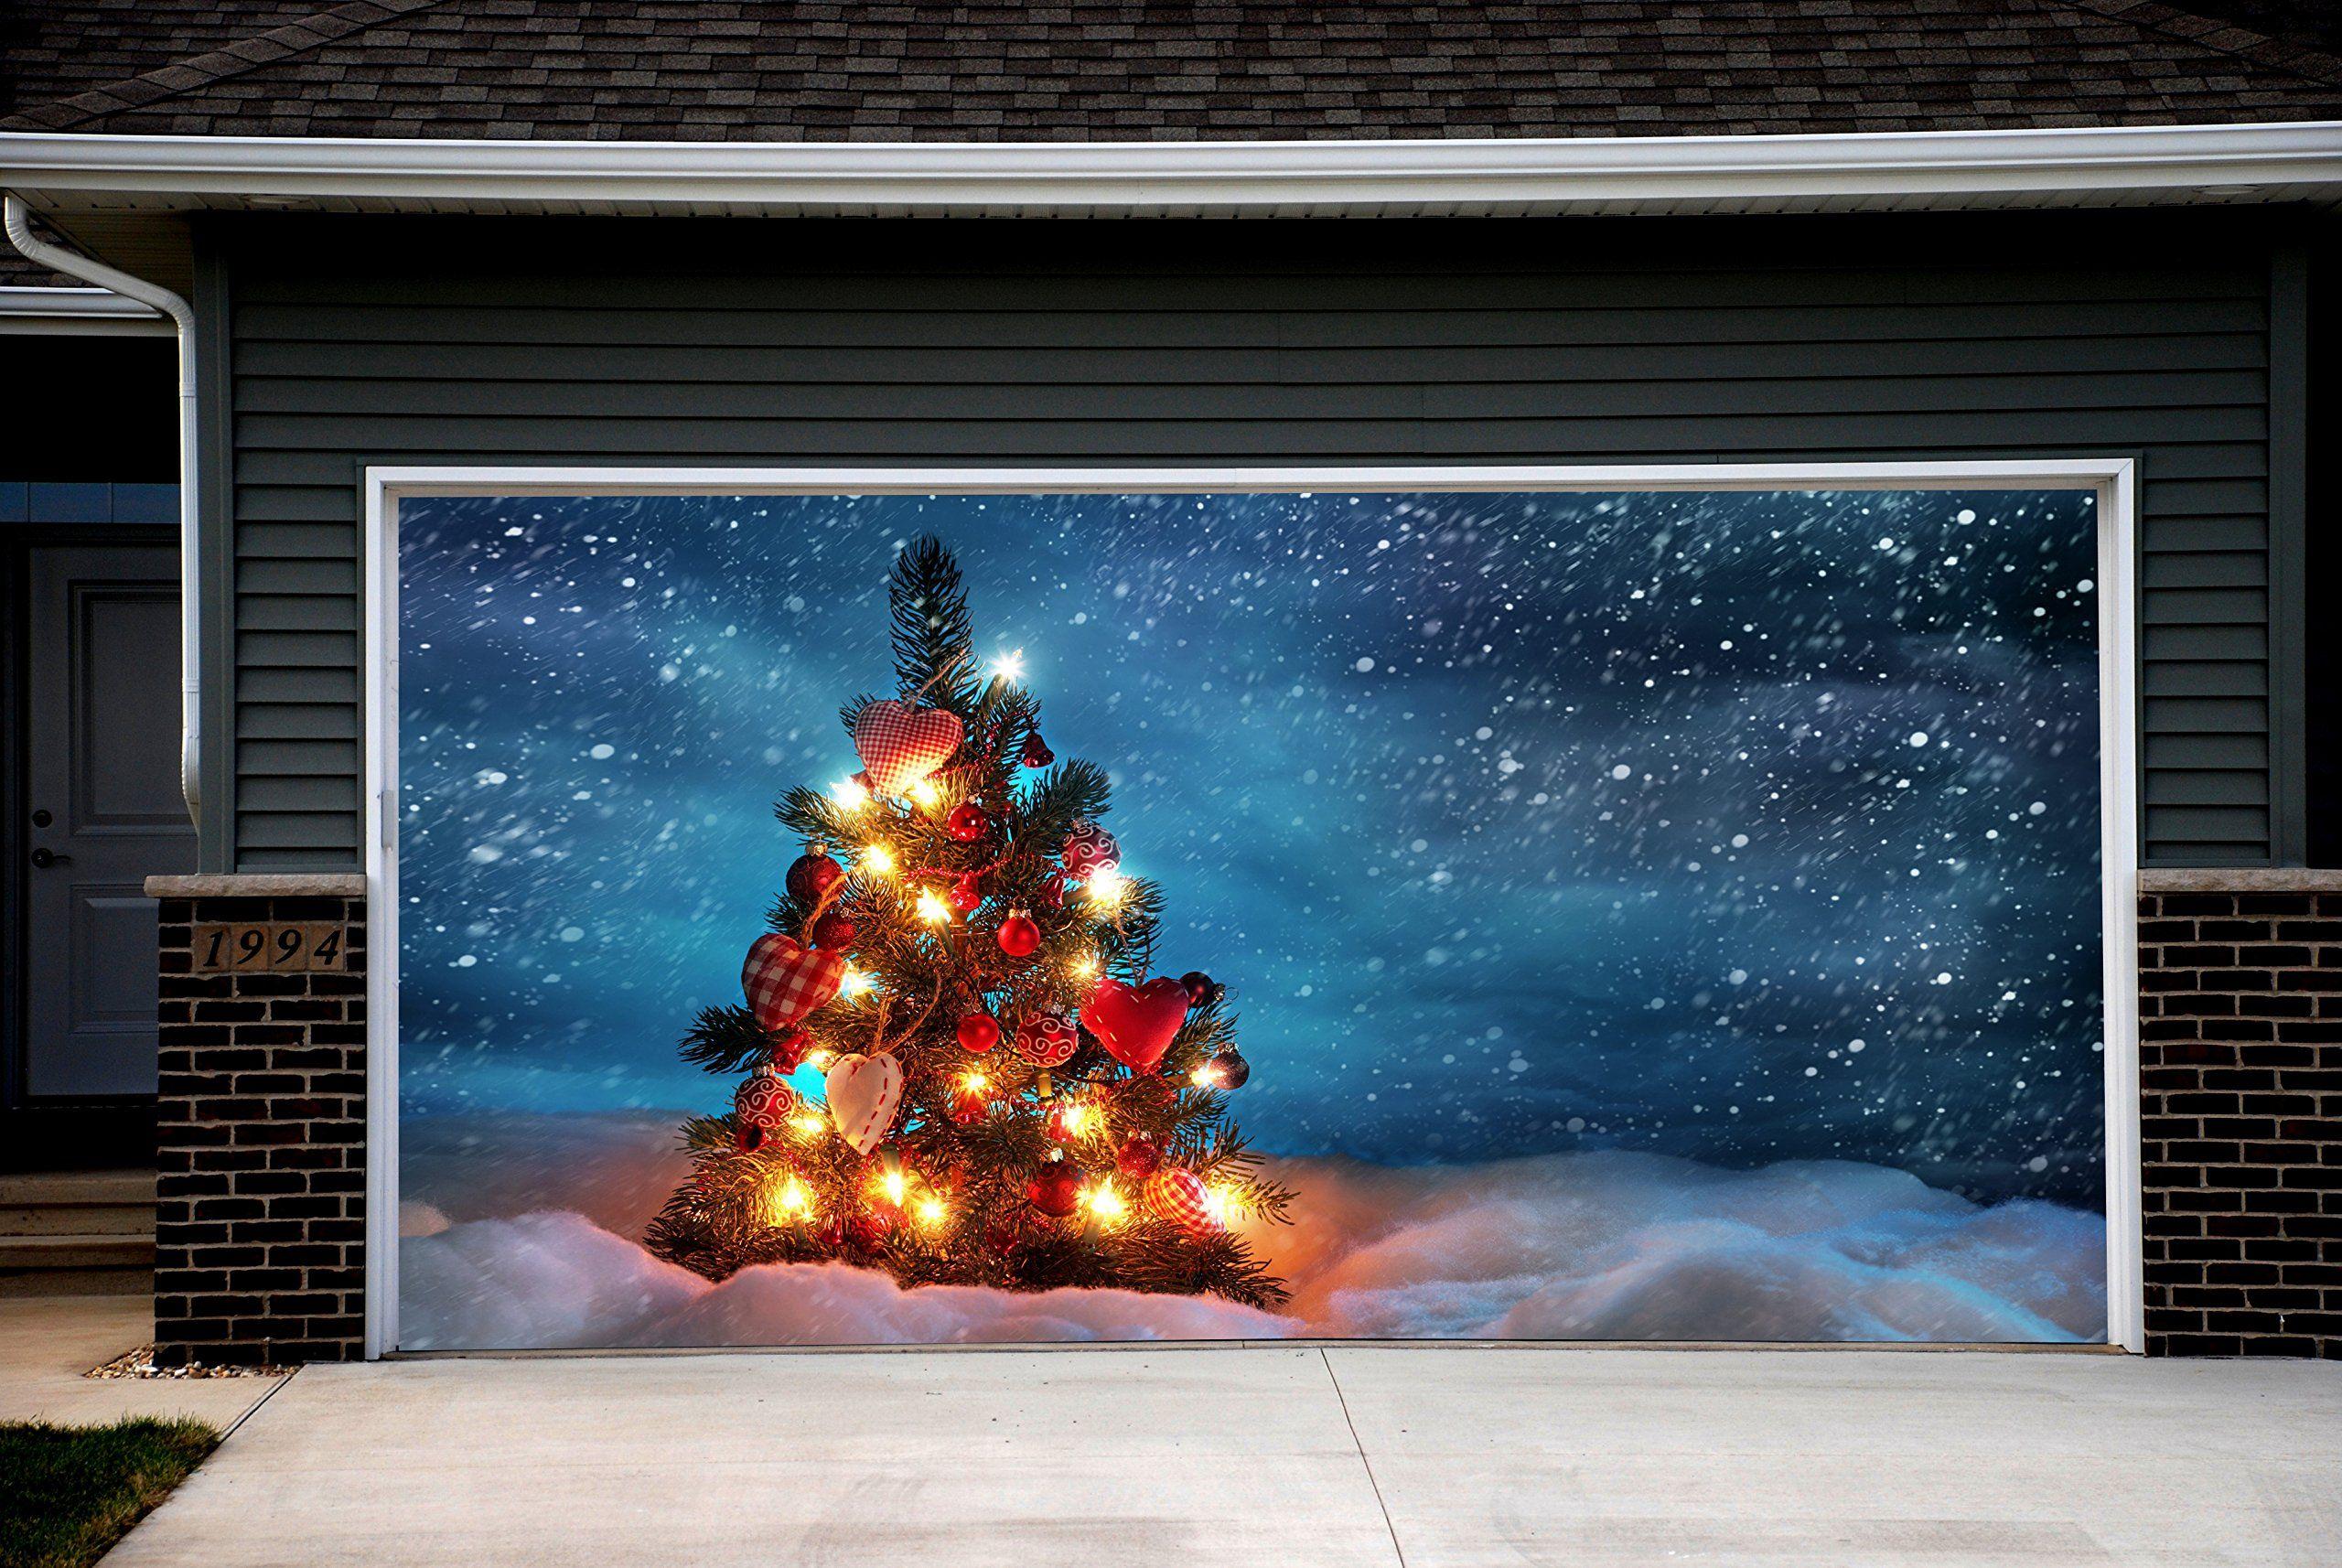 Garage Door Covers christmas tree garage door covers snowman 3d banners outside house